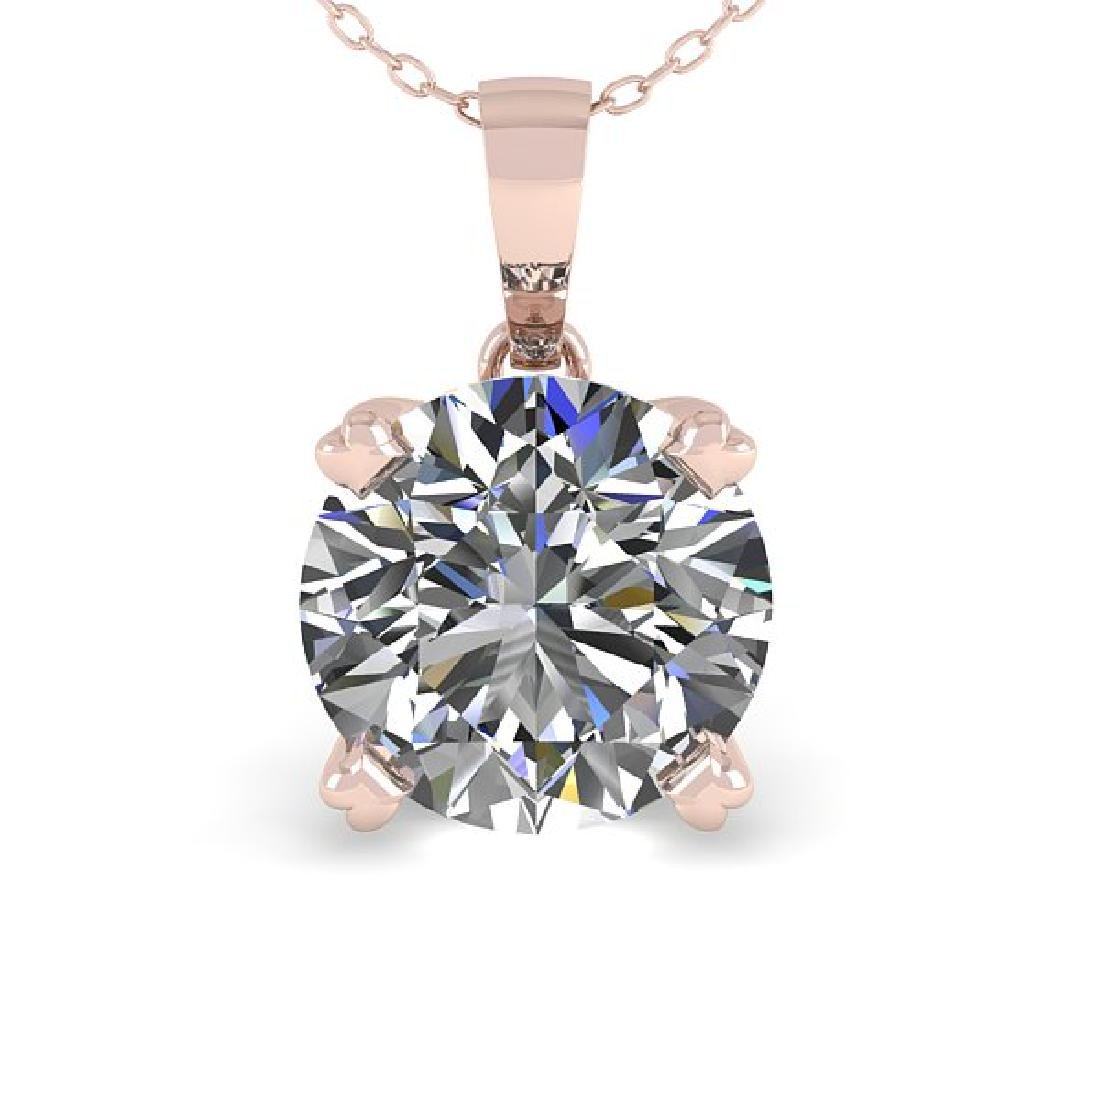 2 CTW Certified VS/SI Diamond Necklace 14K Rose Gold - 2